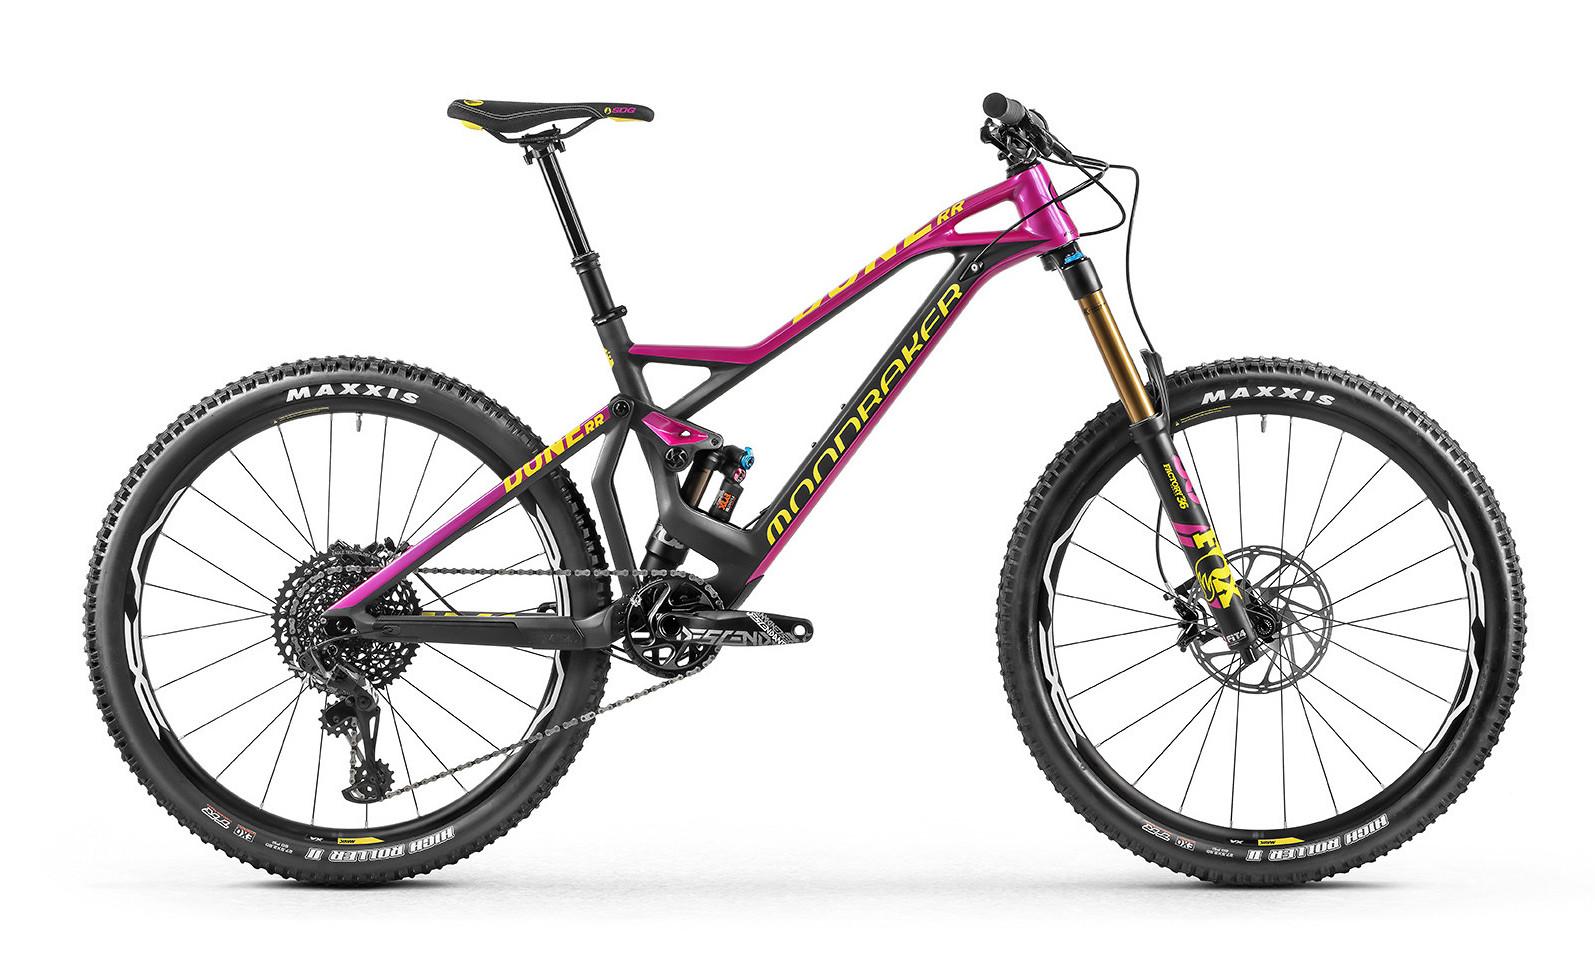 2018 Mondraker Dune Carbon RR Bike 2018_Mondraker_Dune_Carbon_RR